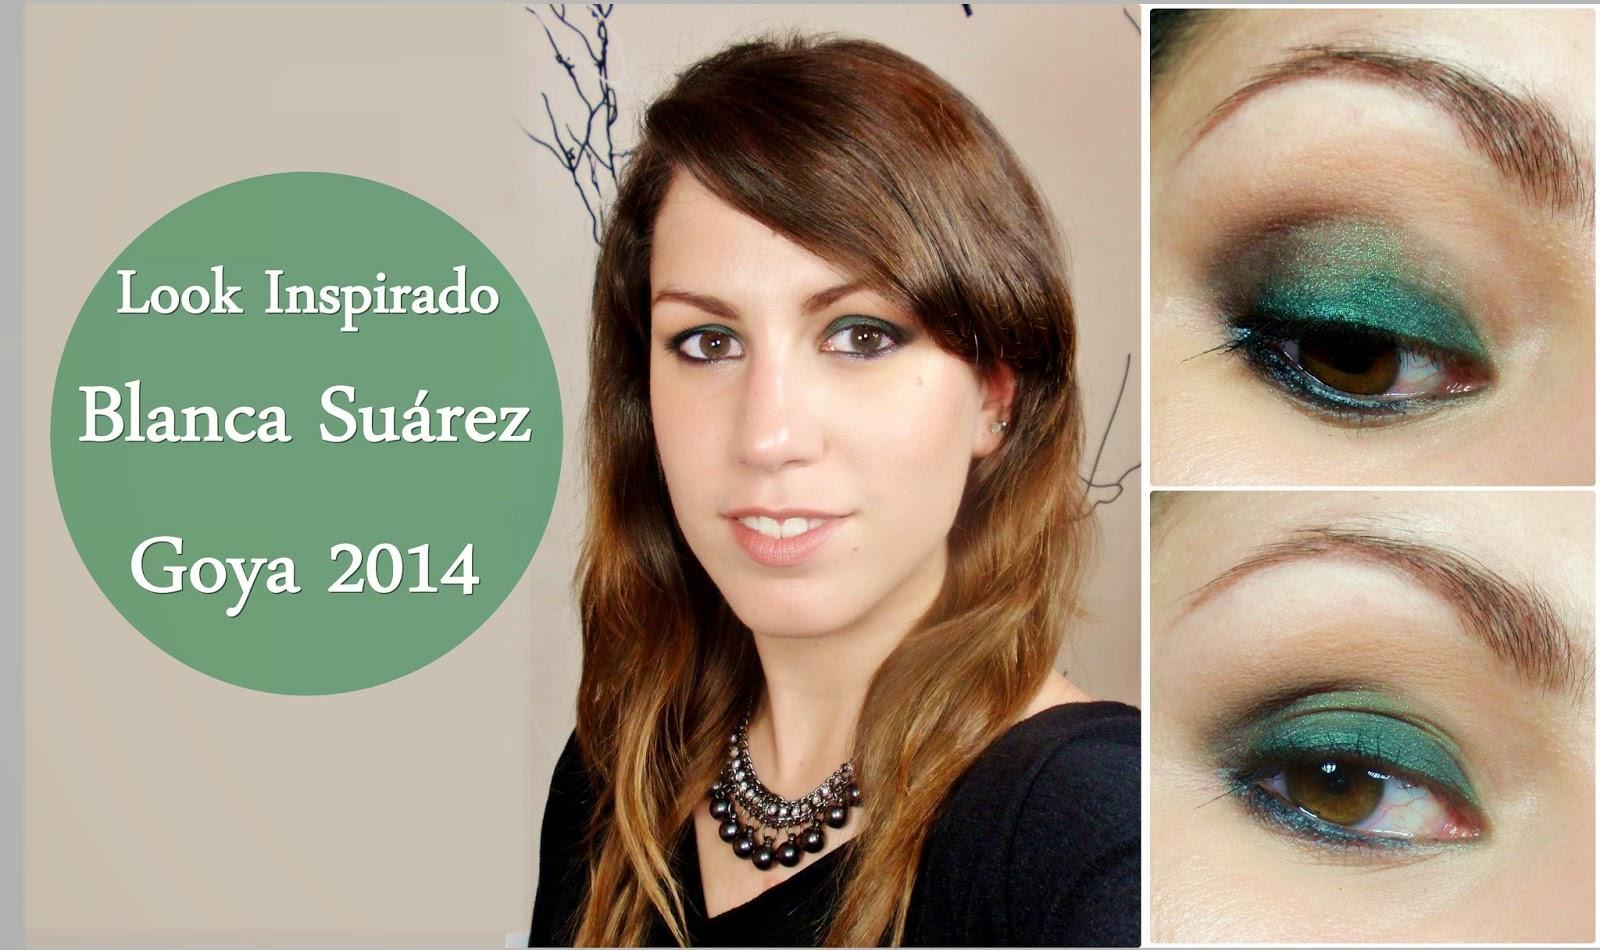 rubibeauty maquillaje inspirado blanca suarez goya 2014